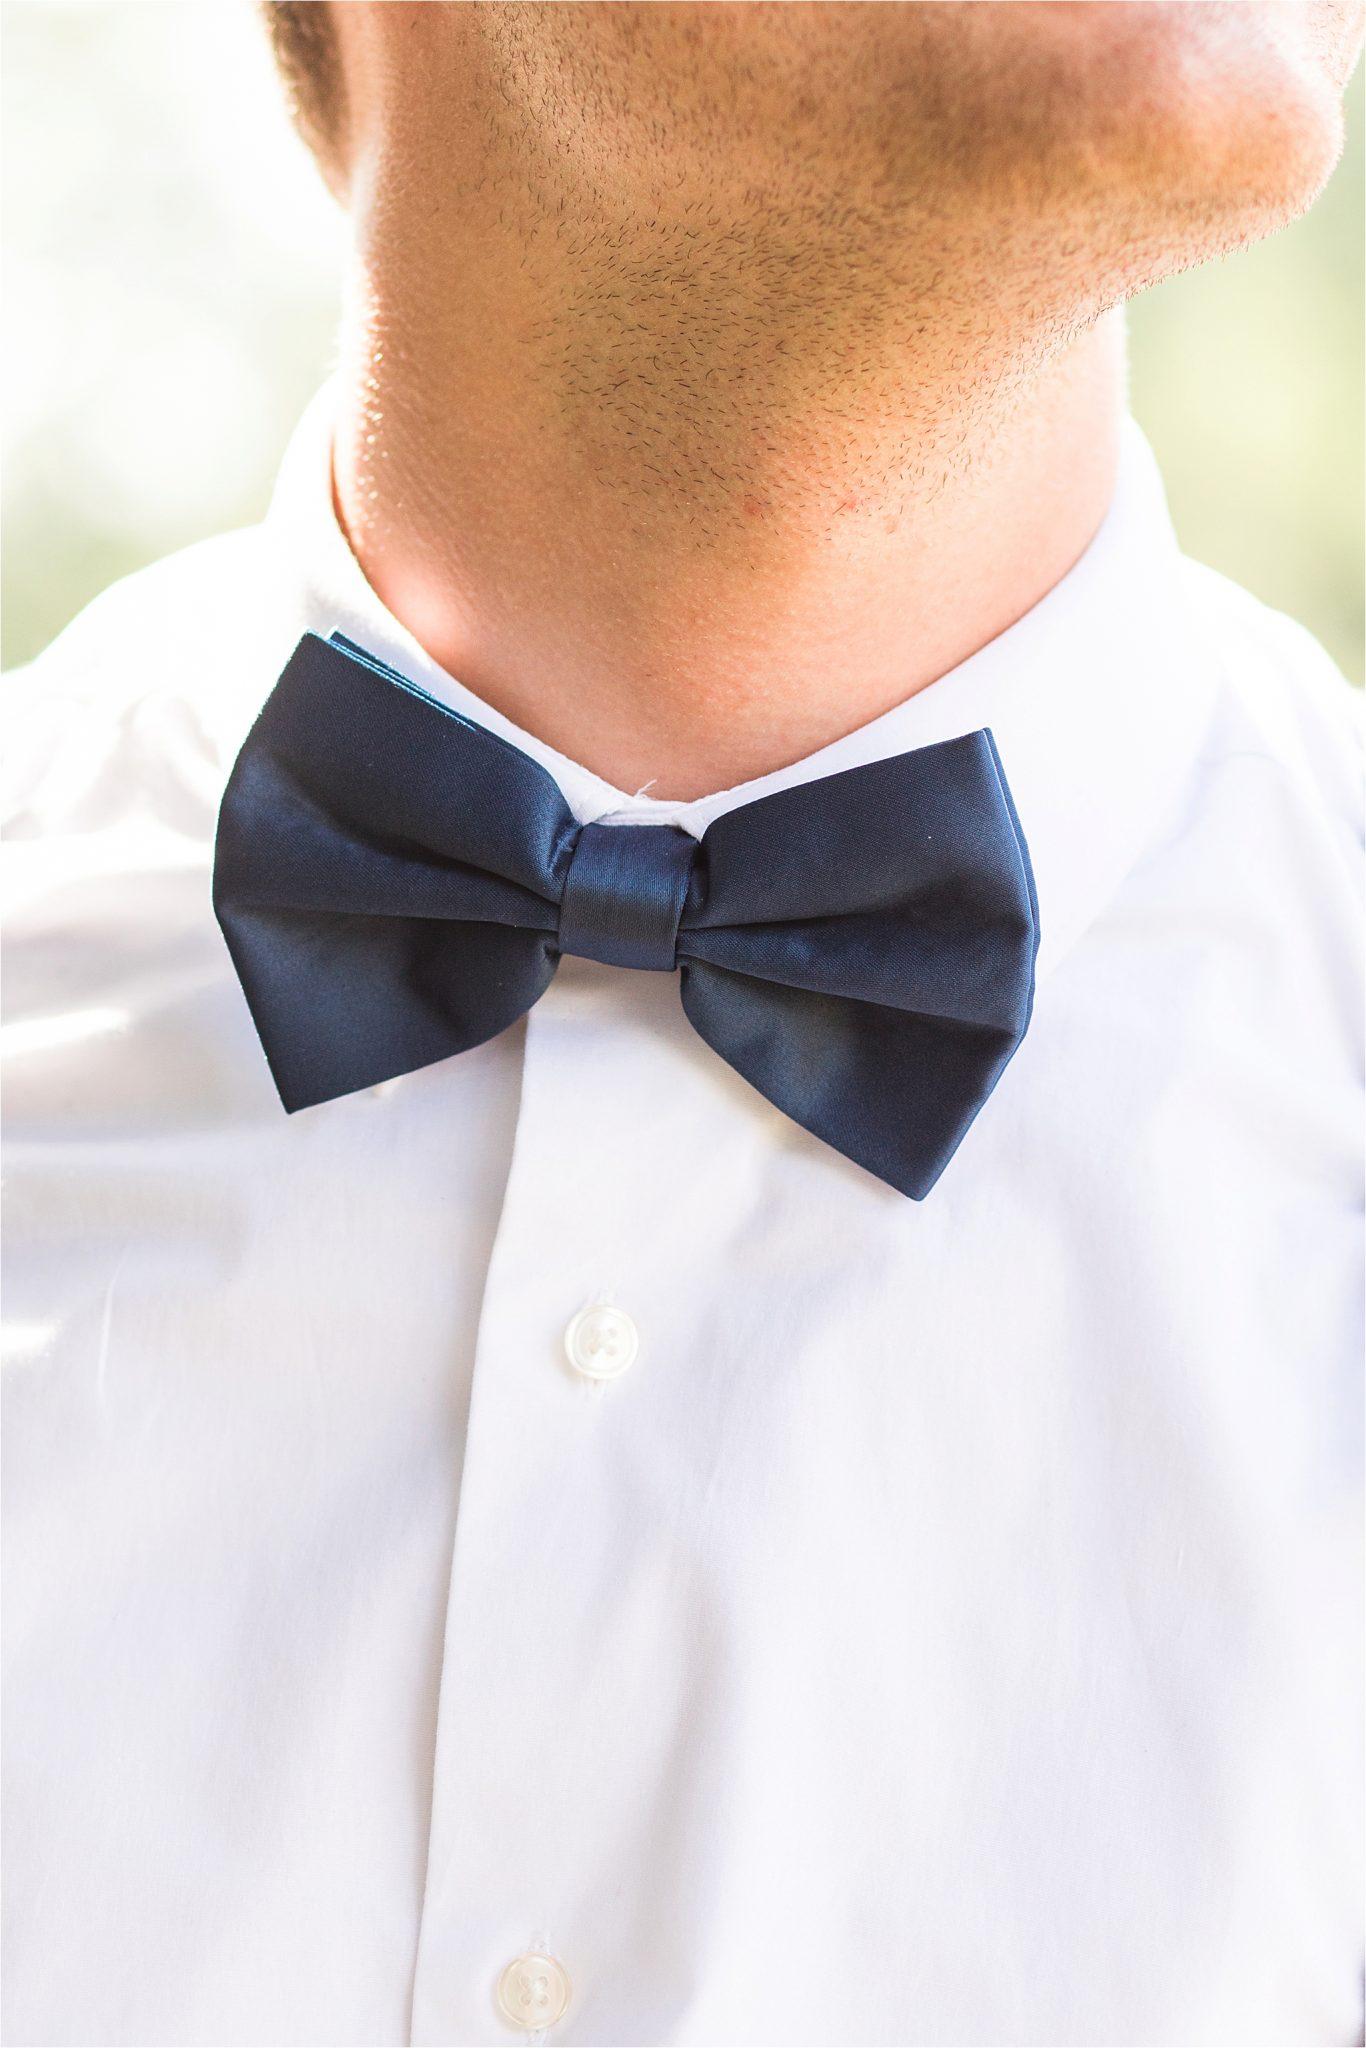 groomsmen-simple-navy-blue-bow-tie-deep-tight-knot